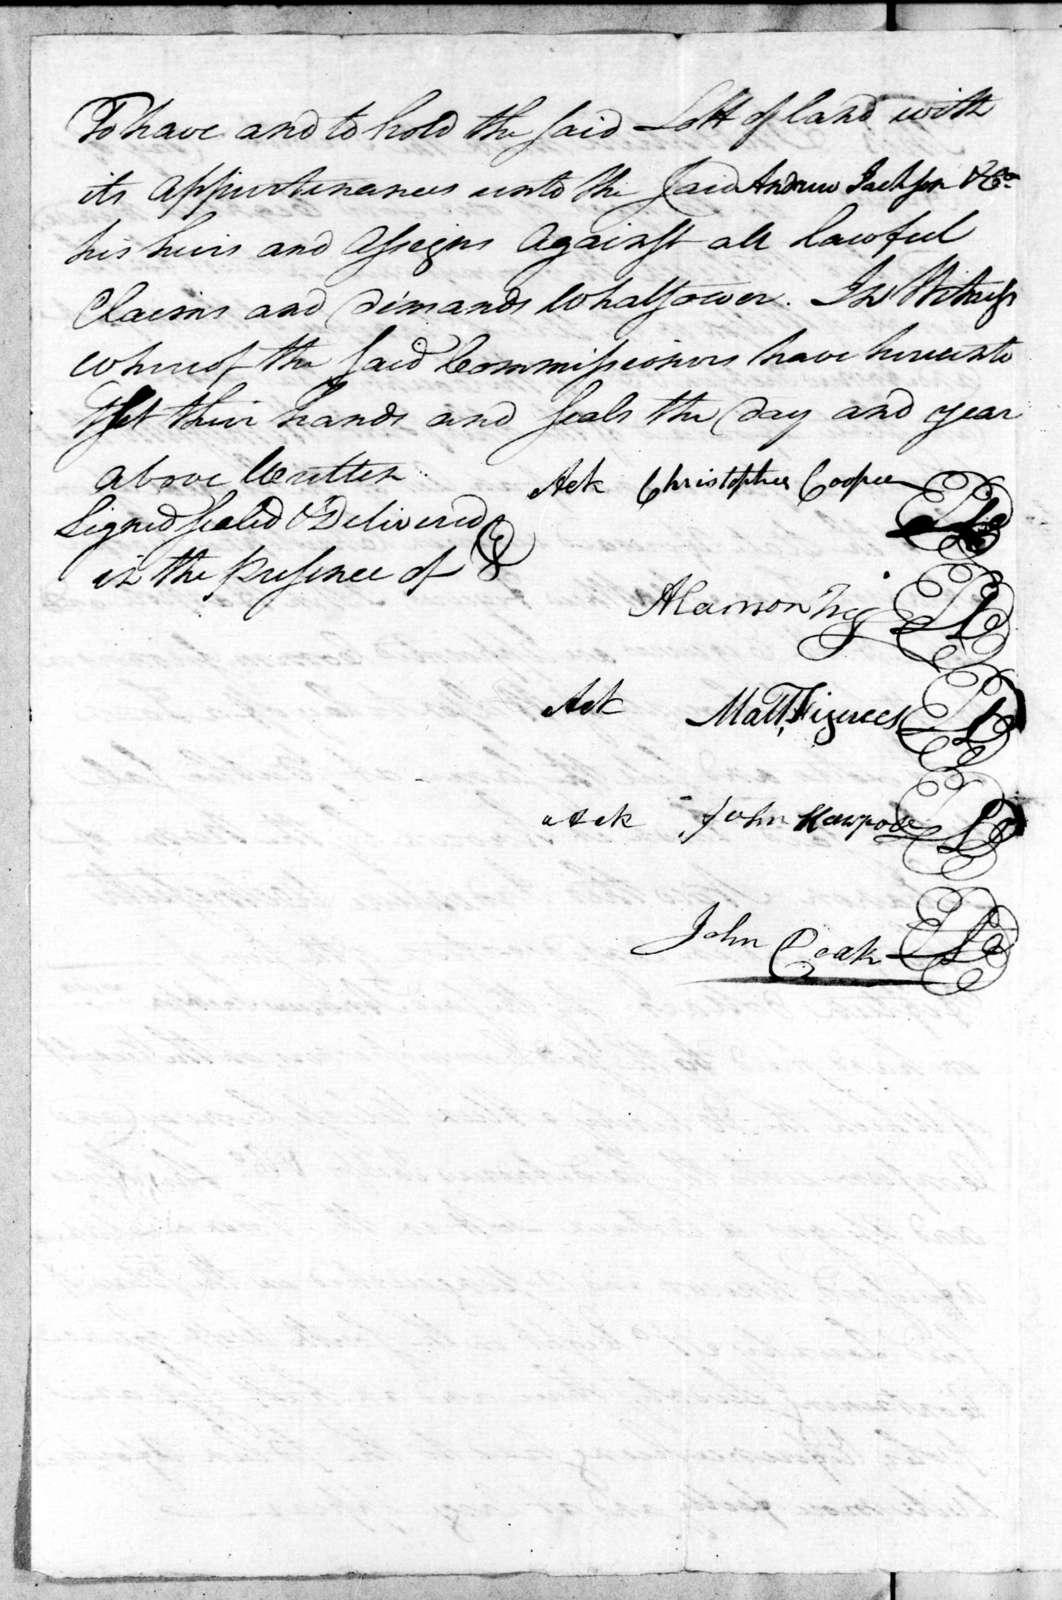 C. Cooper et al to Andrew Jackson, August 16, 1802